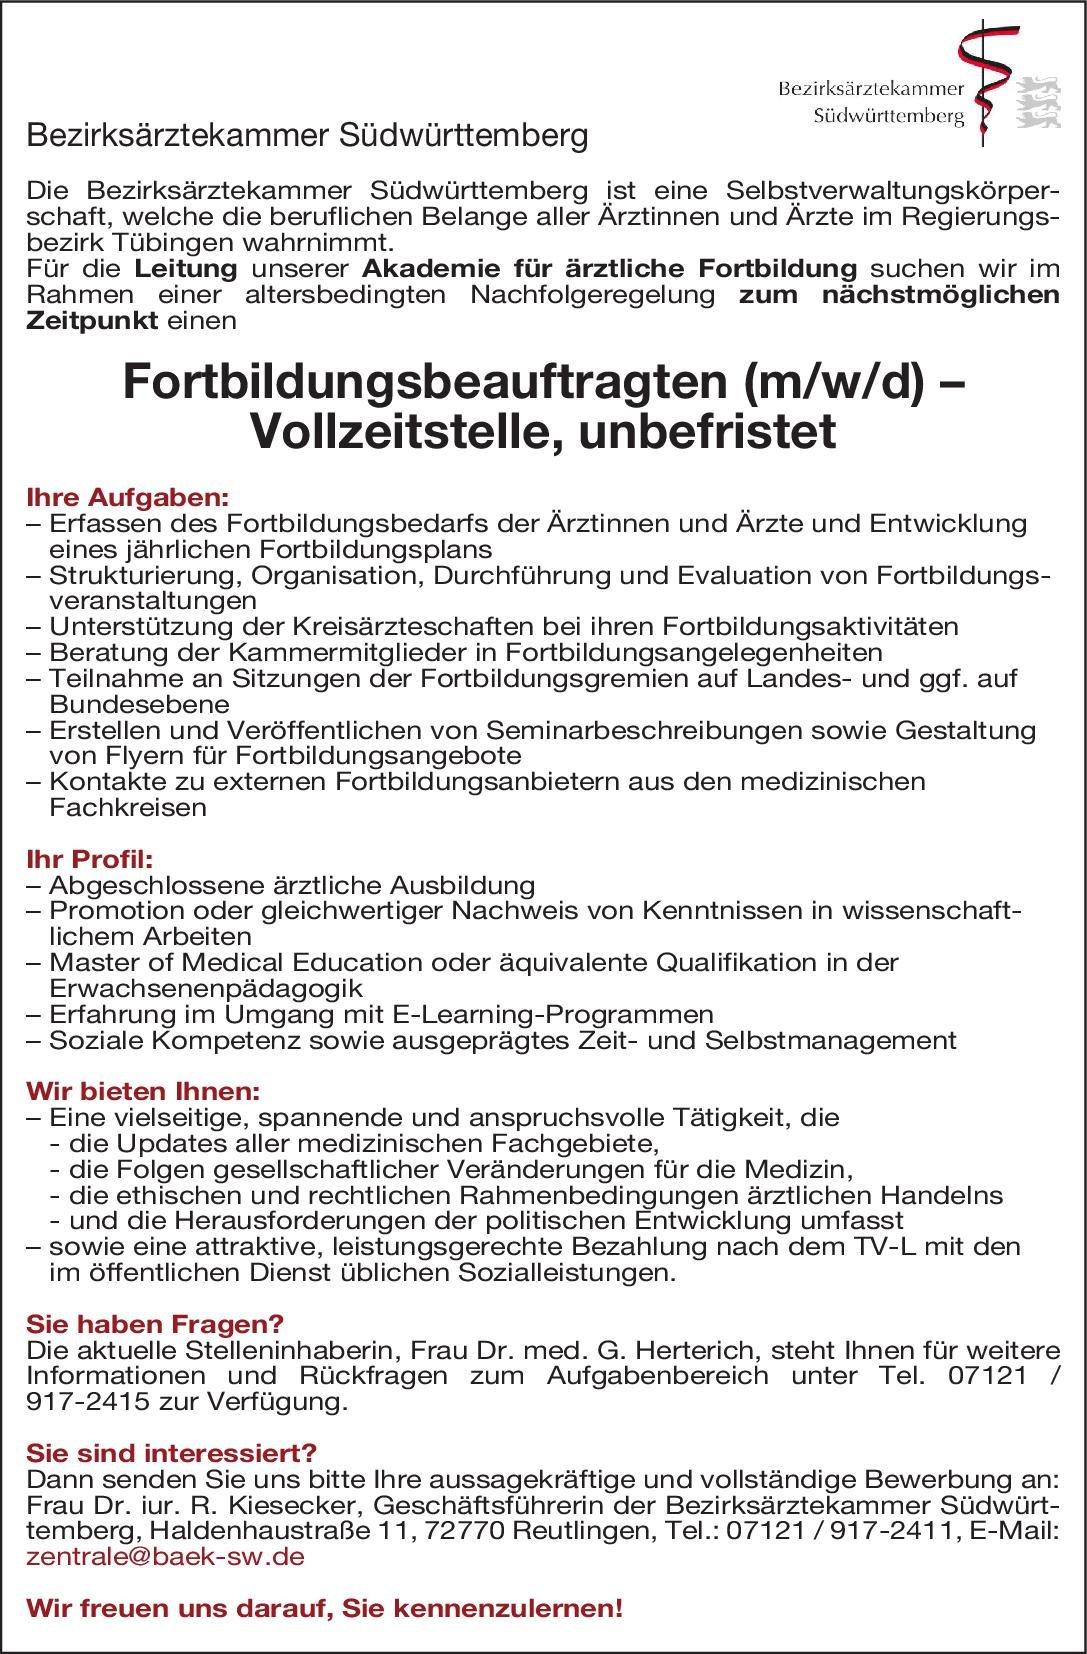 Bezirksärztekammer Südwürttemberg Fortbildungsbeauftragter (m/w/d) * ohne Gebiete Arzt / Facharzt